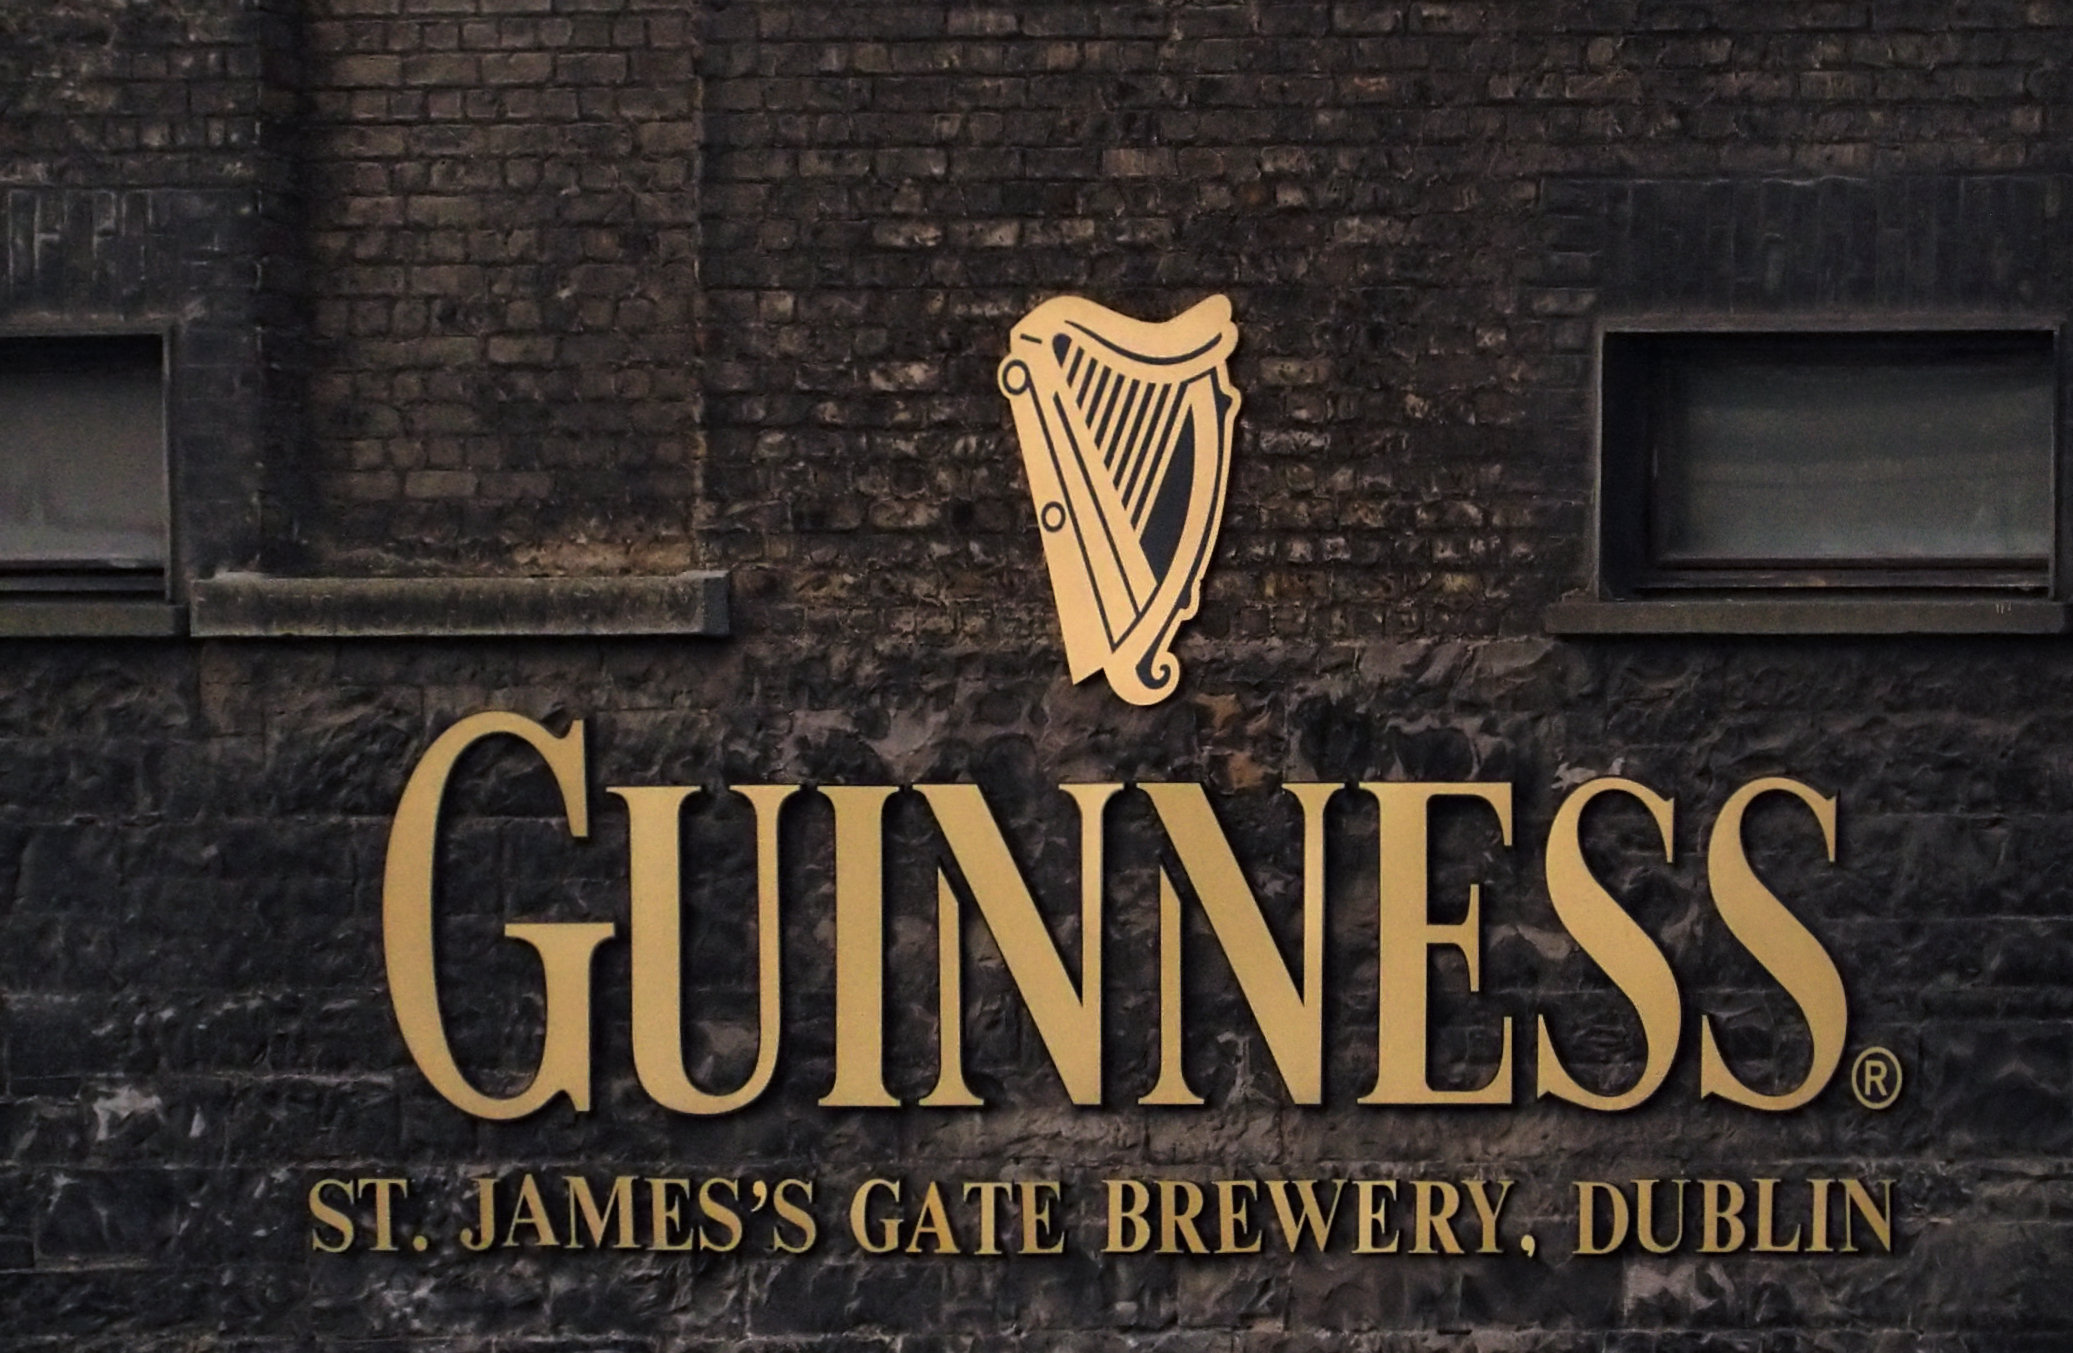 St._James's_Gate_Brewery,_Dublin,_Ireland